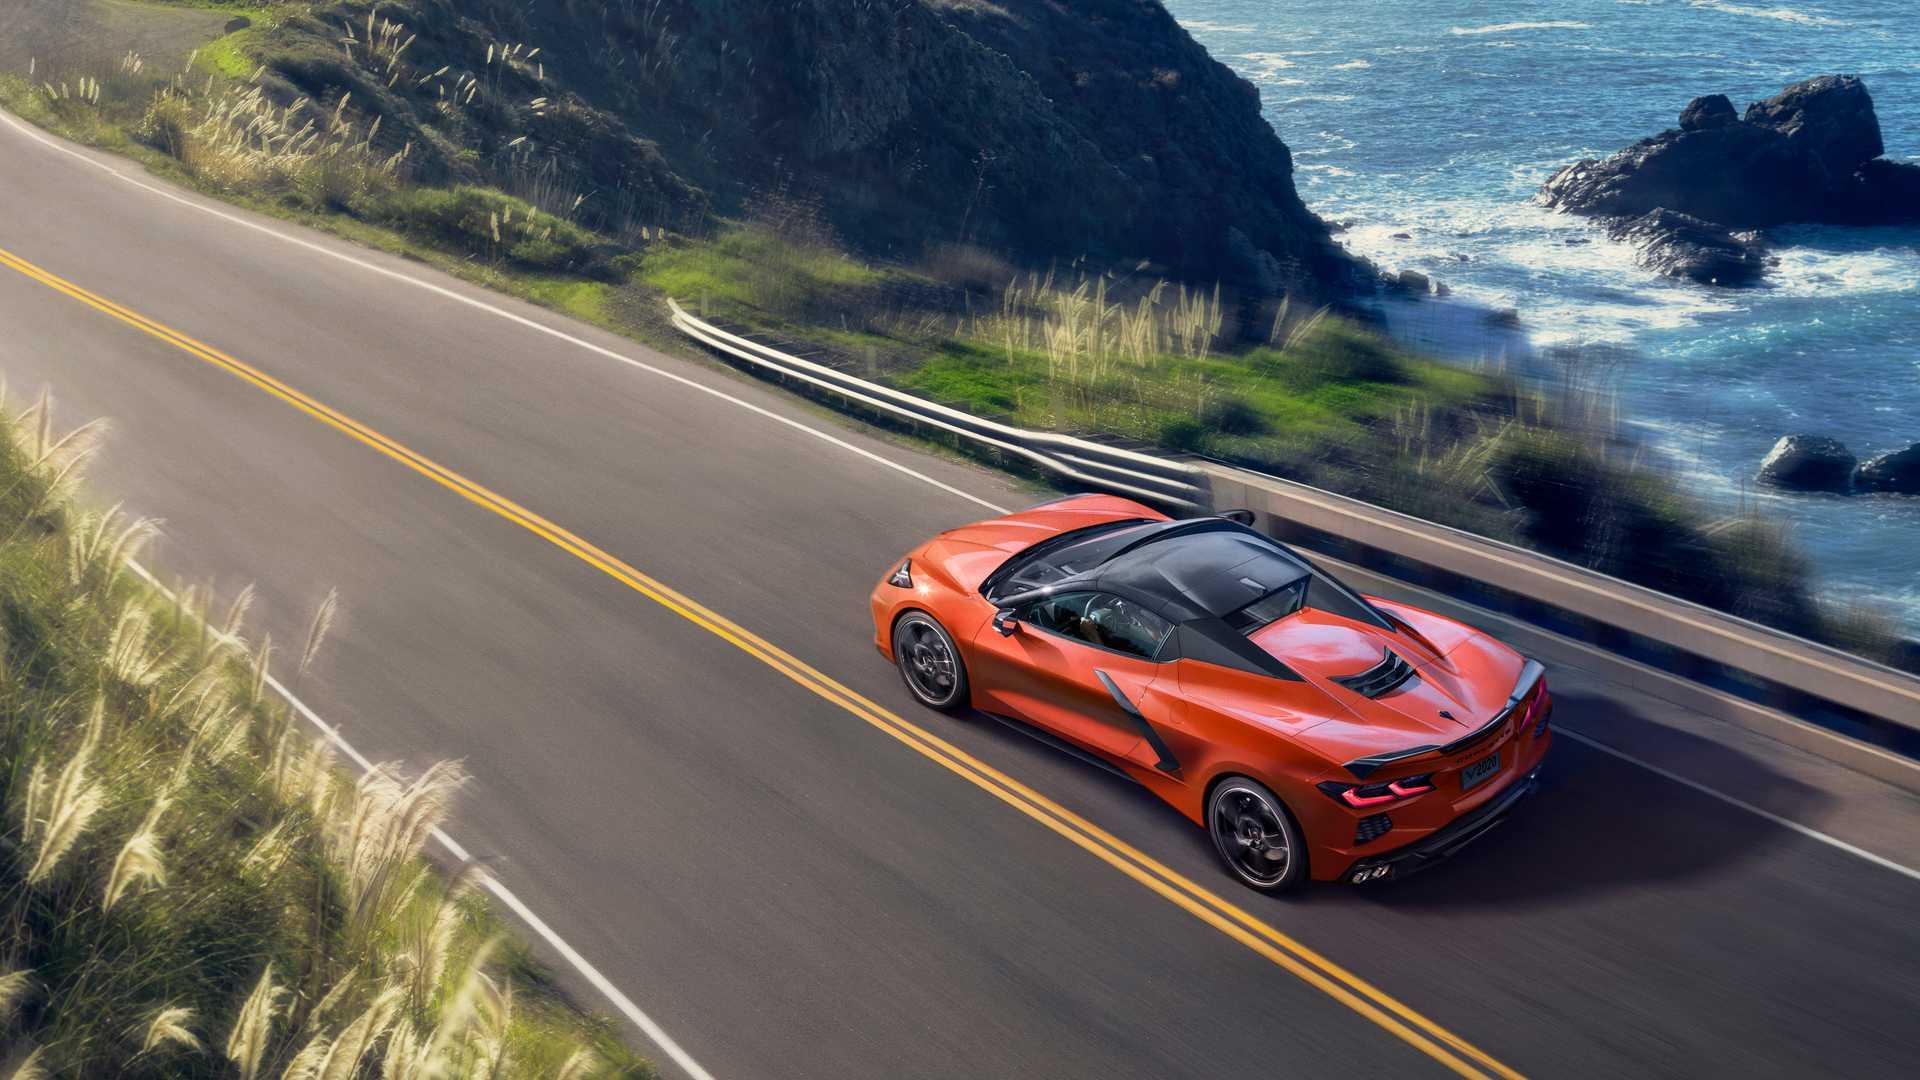 2020-chevrolet-corvette-convertible-2